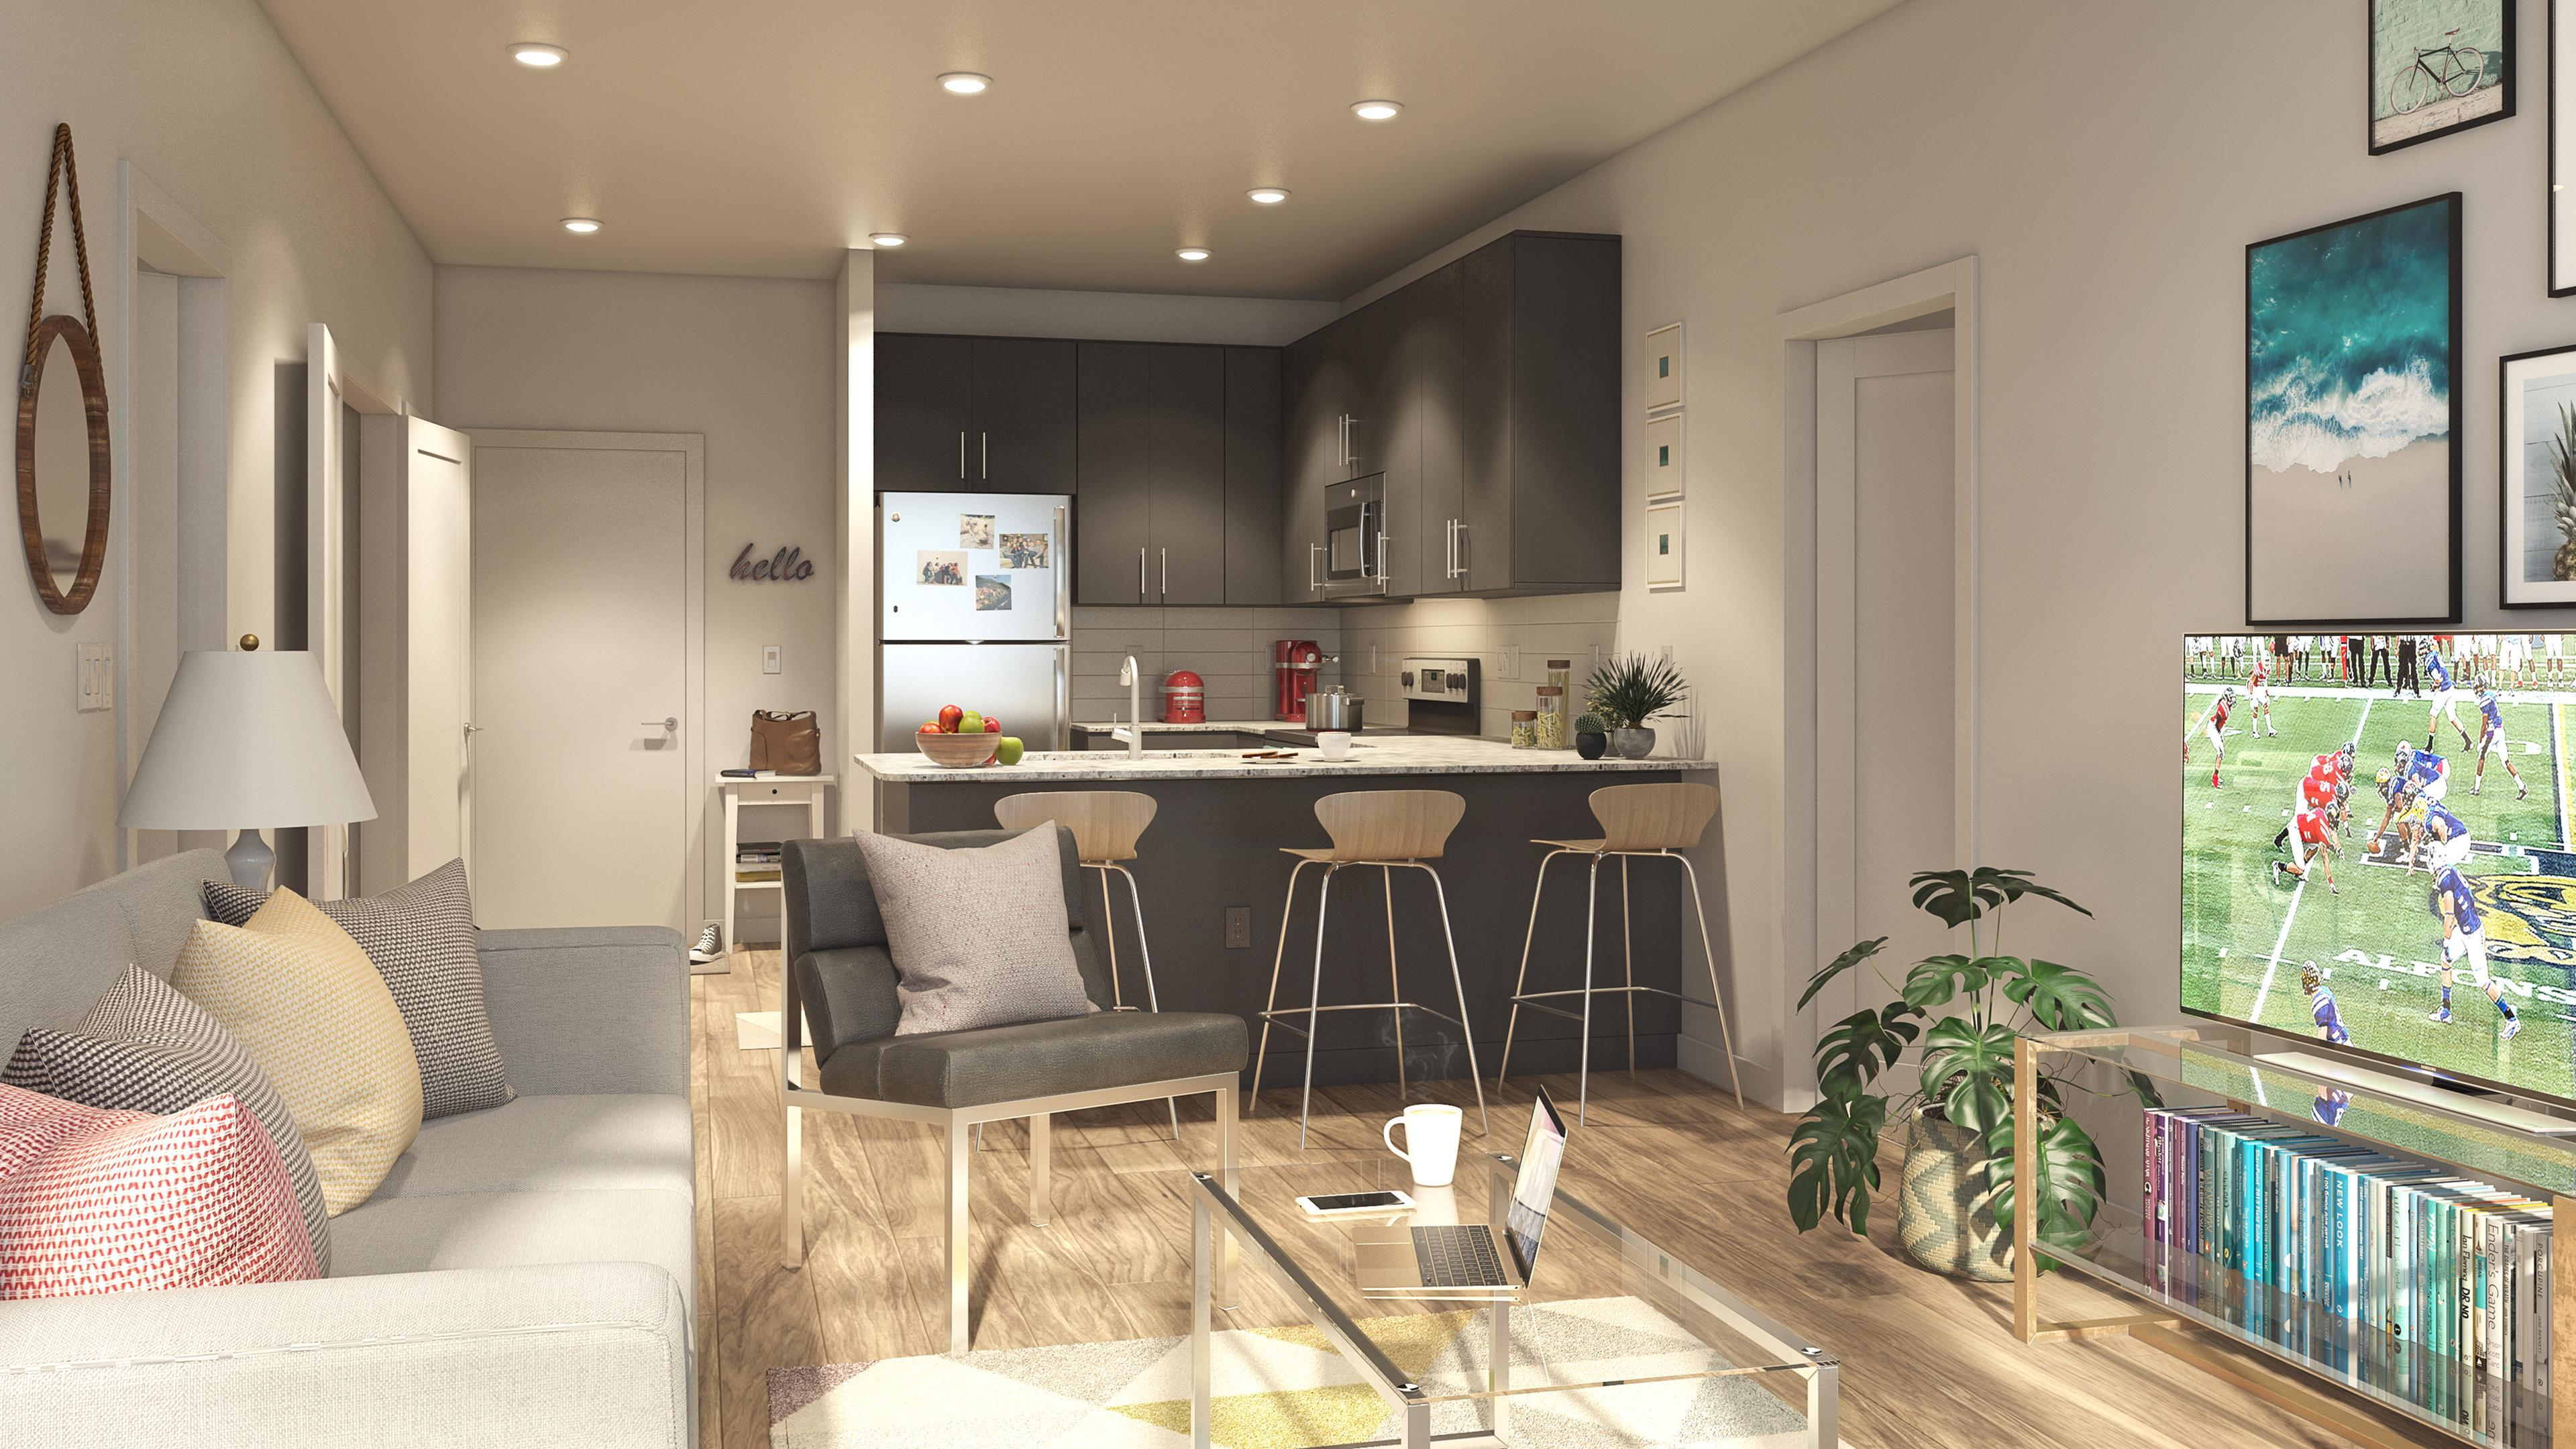 Onshore Daytona Apartments Reviews, Ratings | Apartments near 1100 Halifax Medical Center Drive , Daytona Beach FL